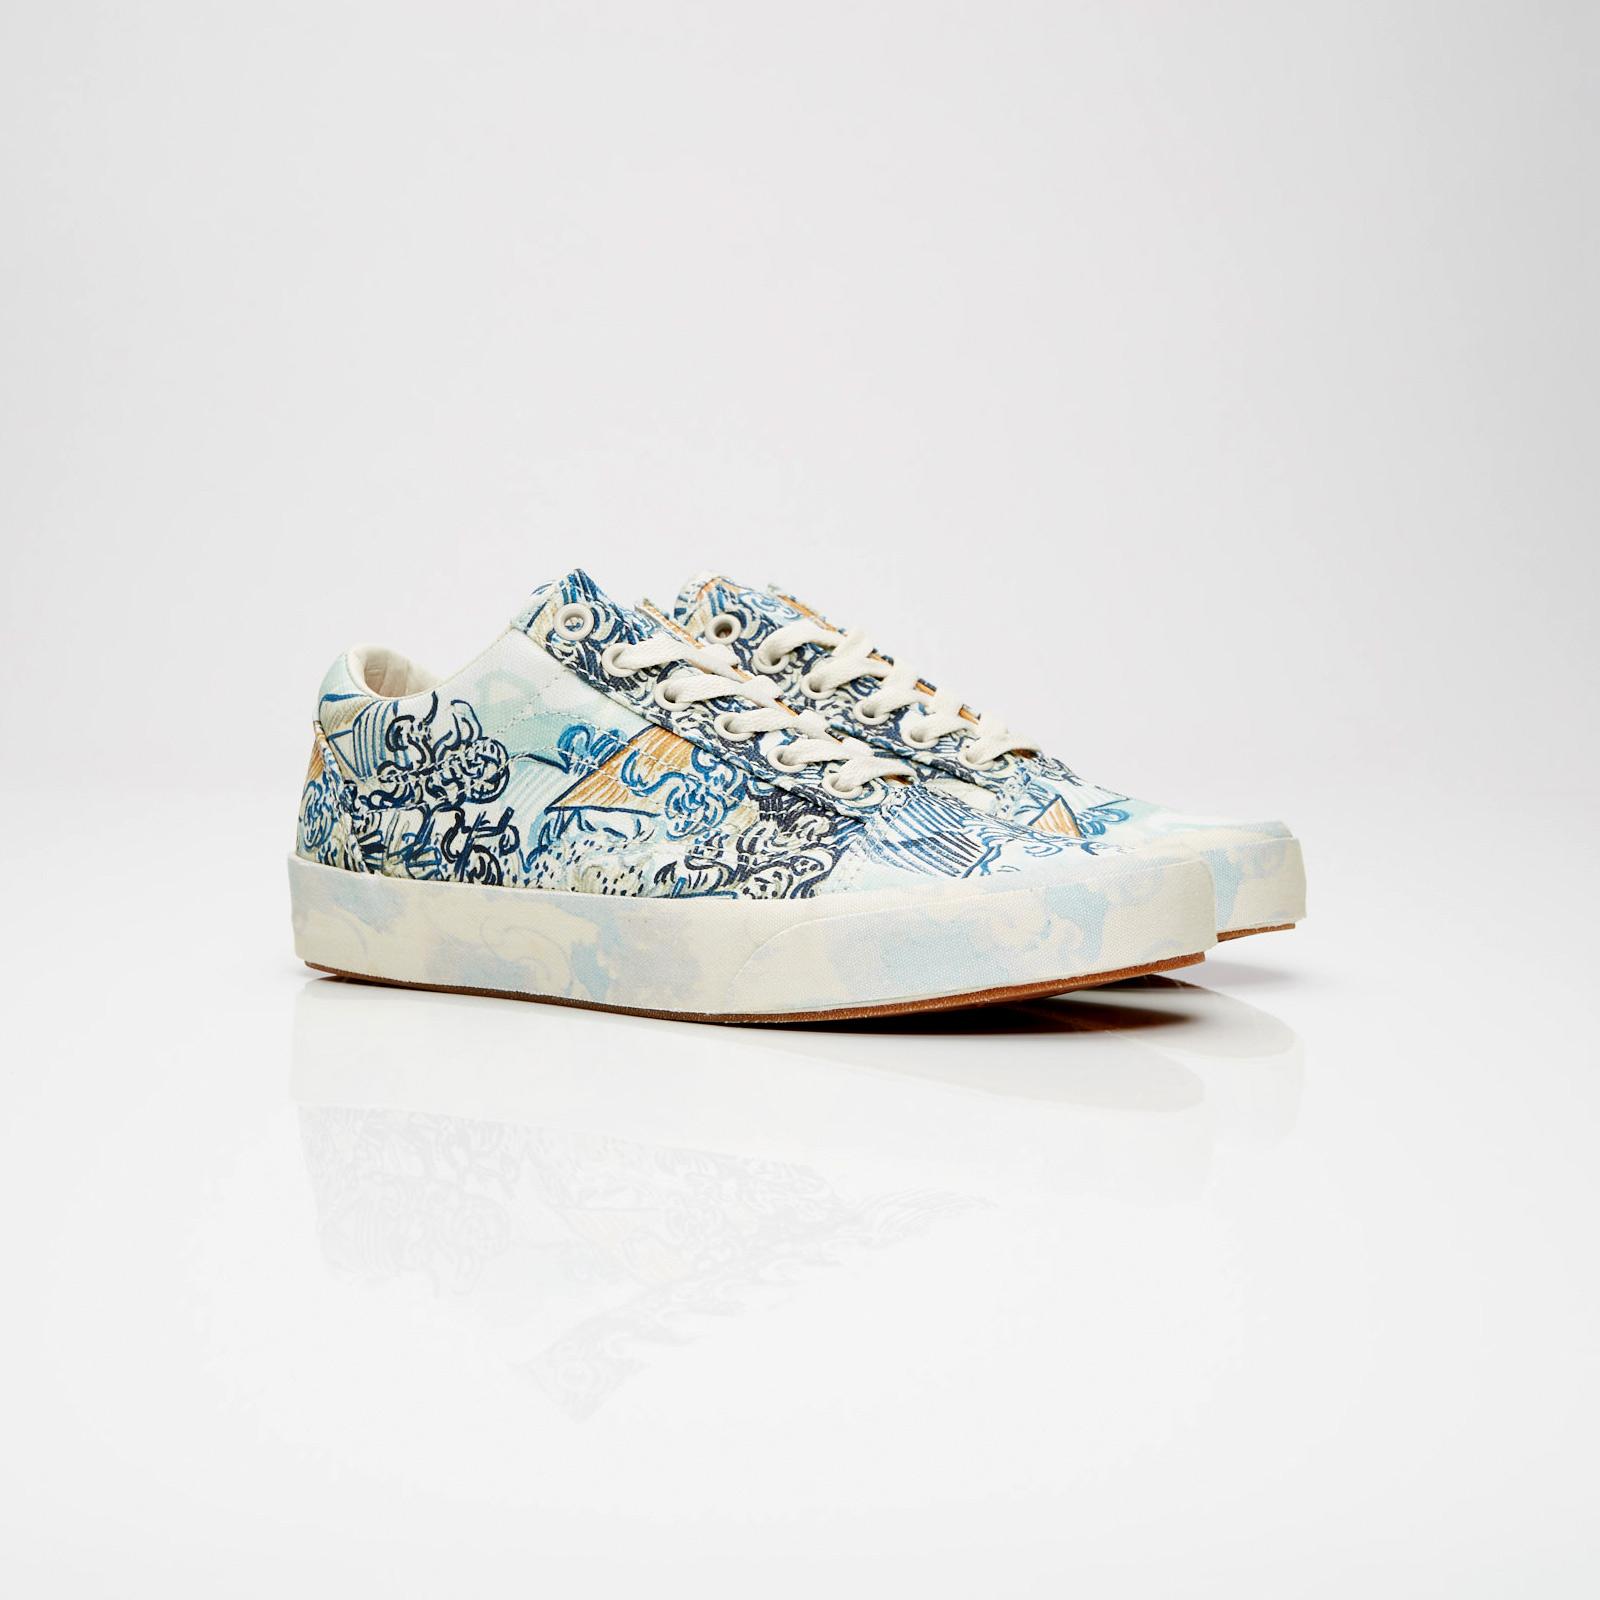 fef688e0571724 Vans Vincent Van Gogh Old Skool - Va38g1uax - Sneakersnstuff ...